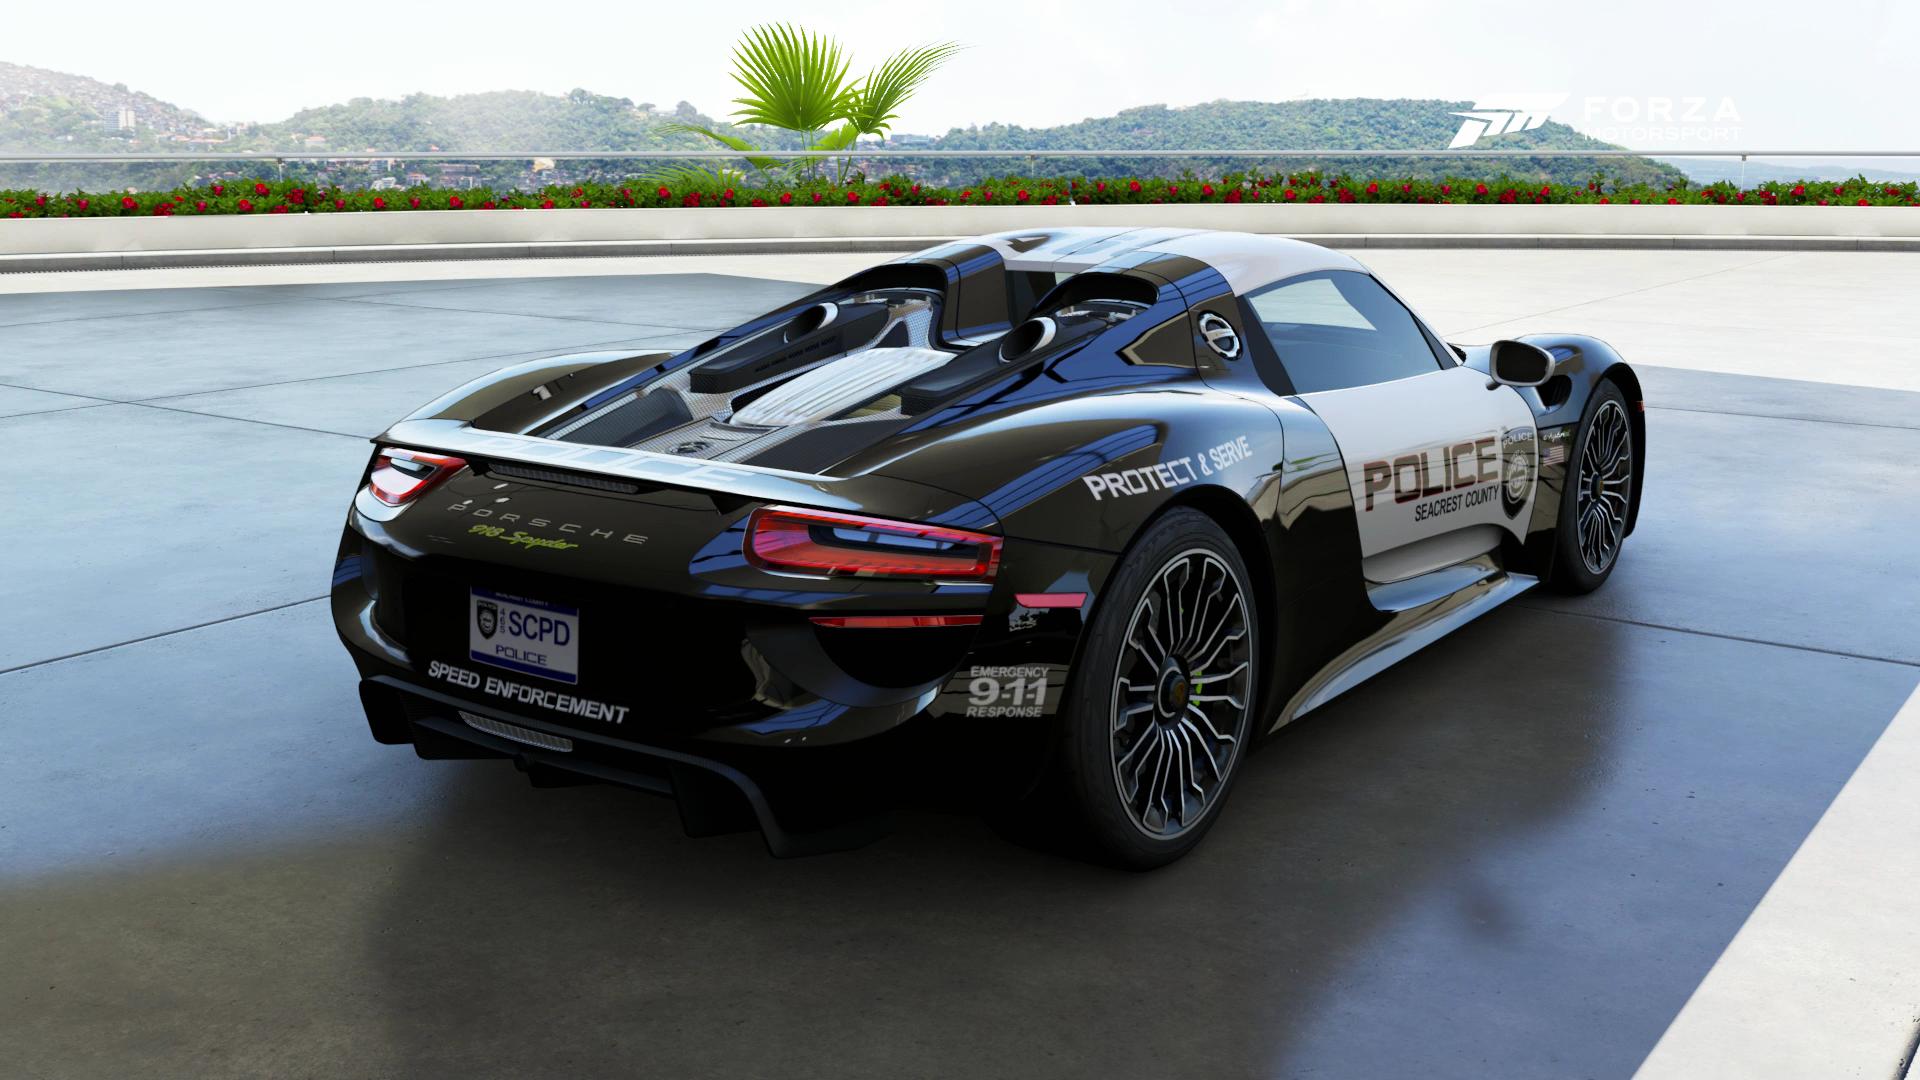 scpd___2014_porsche_918_spyder___back_by_xboxgamer969-d9ttiqs Mesmerizing Porsche 918 Spyder London Ontario Cars Trend